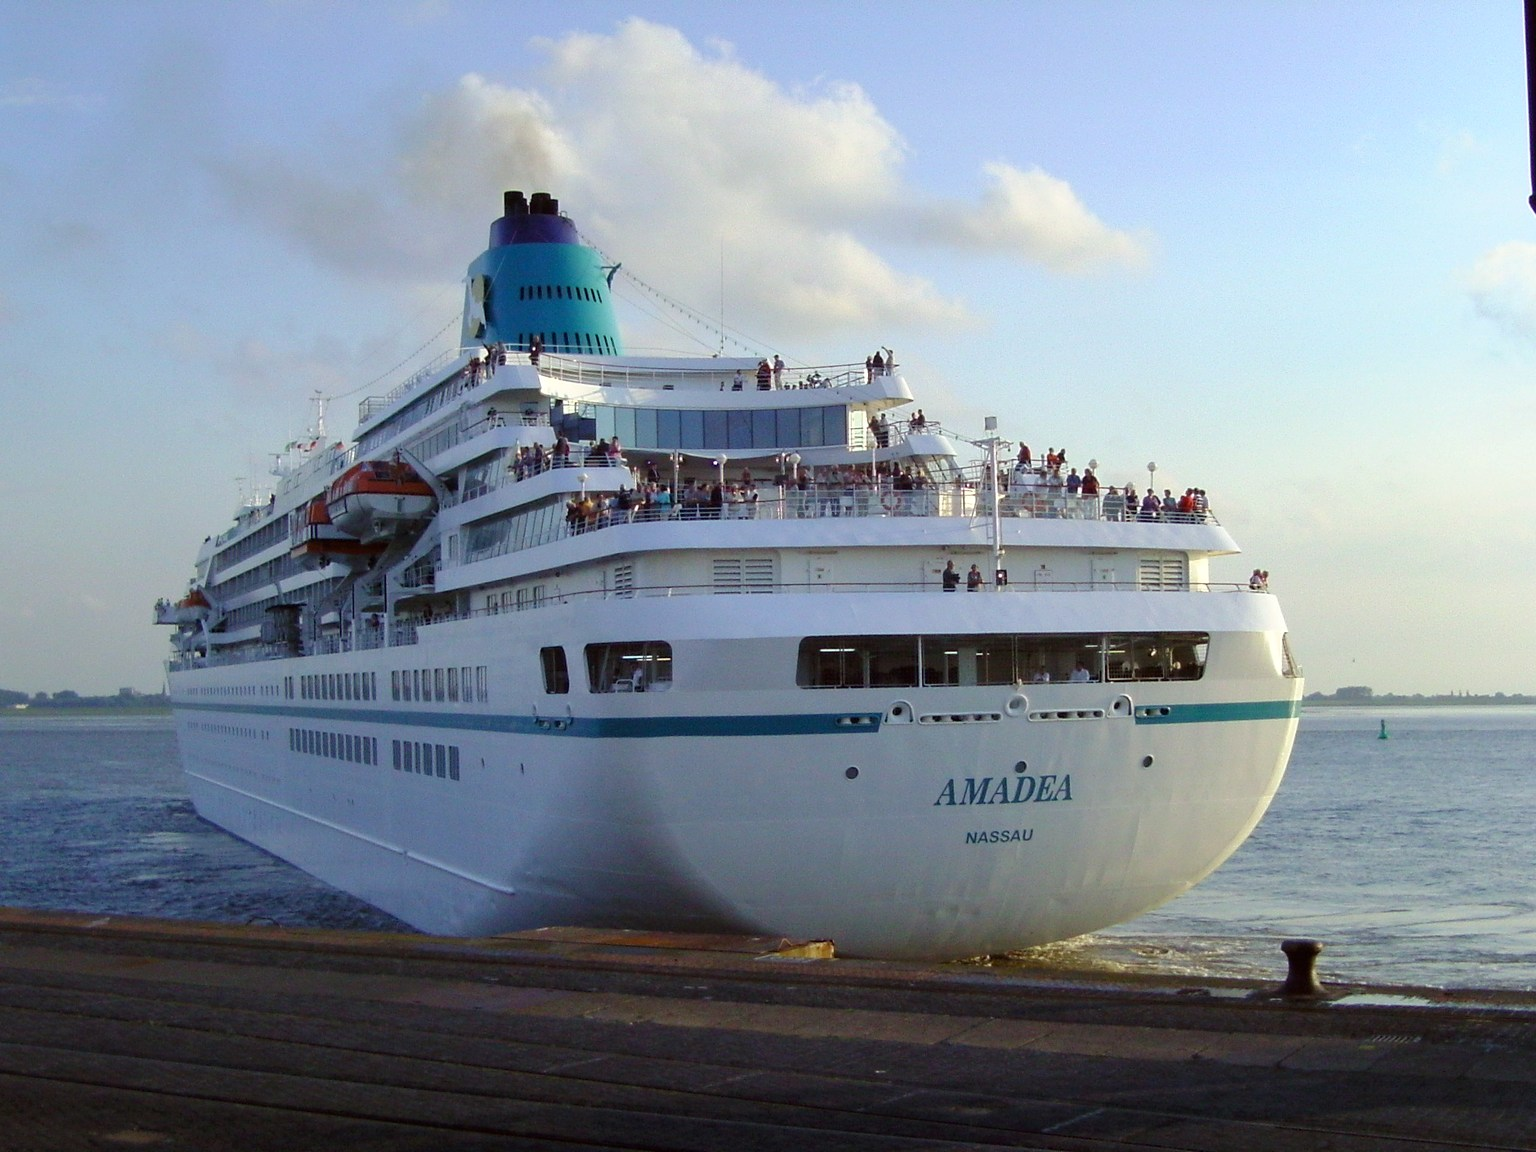 FileCruise Ship Amadea Jpg Wikimedia Commons - Cruise ship amadea